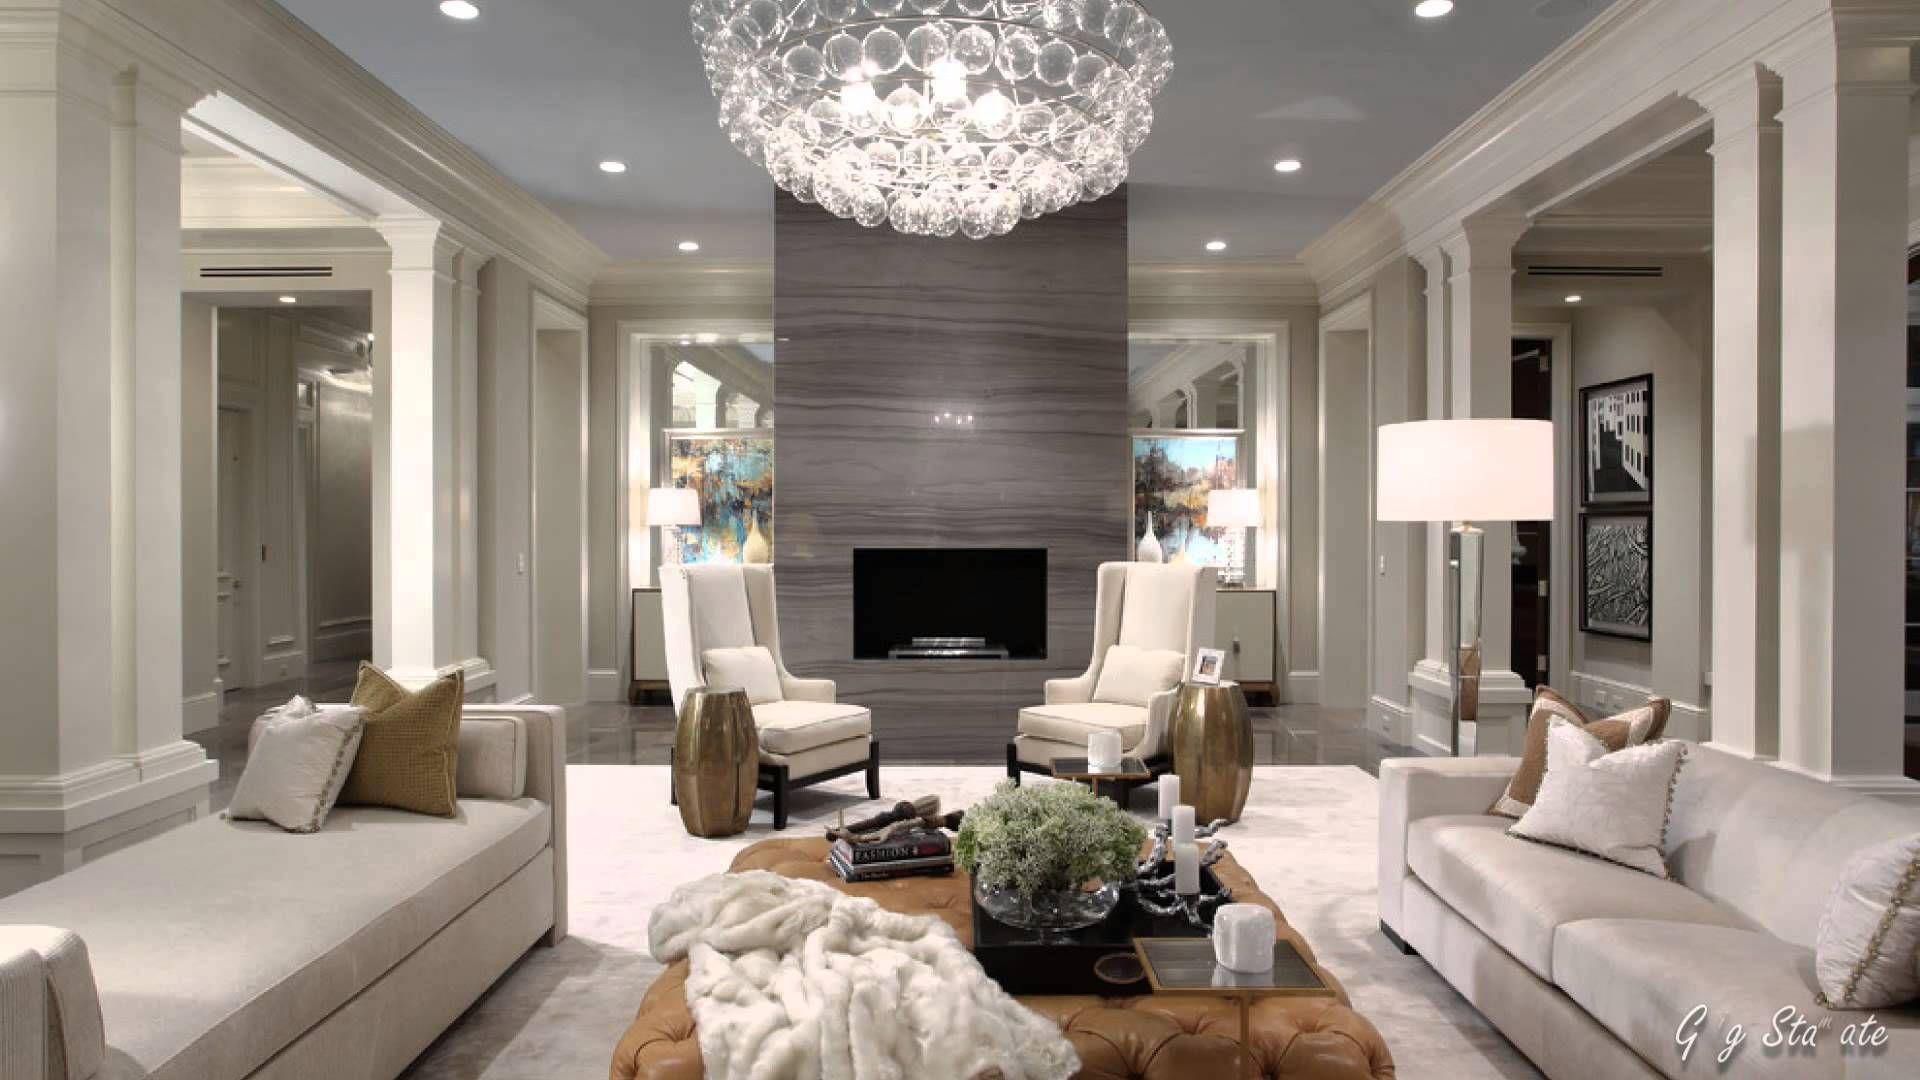 Best Glamorous Living Room Designs That Wows Glamorous Living 400 x 300